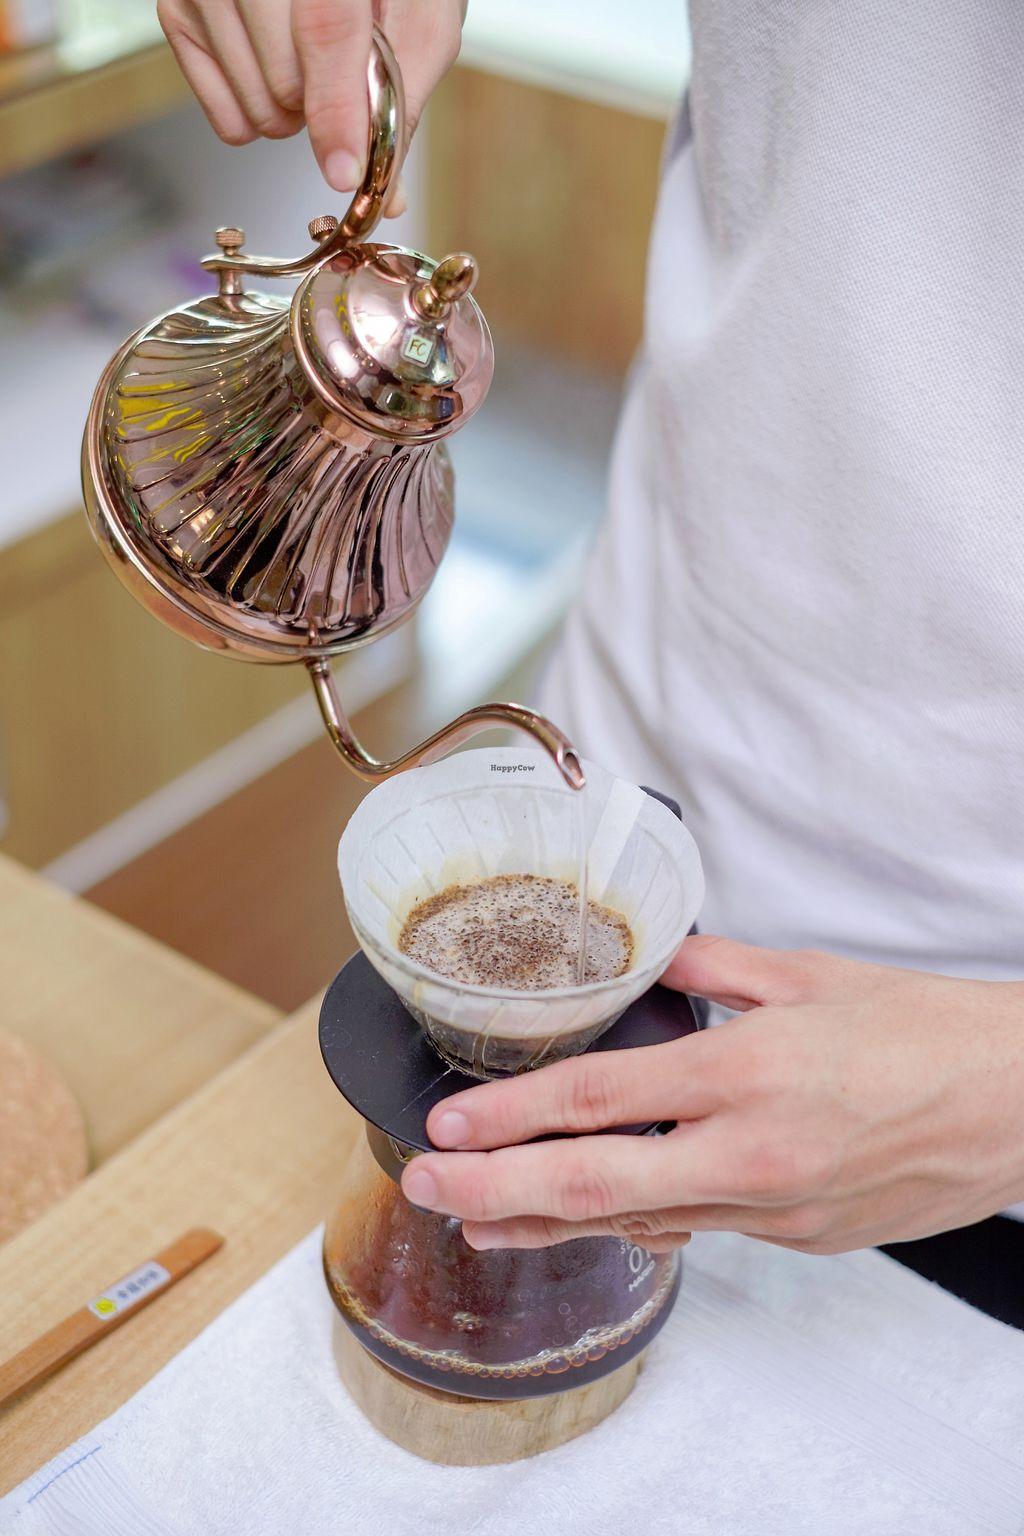 "Photo of LN Fortunate Coffee - Cemara Asri  by <a href=""/members/profile/YansenChandra"">YansenChandra</a> <br/>Manual brew process <br/> July 1, 2017  - <a href='/contact/abuse/image/95045/275416'>Report</a>"